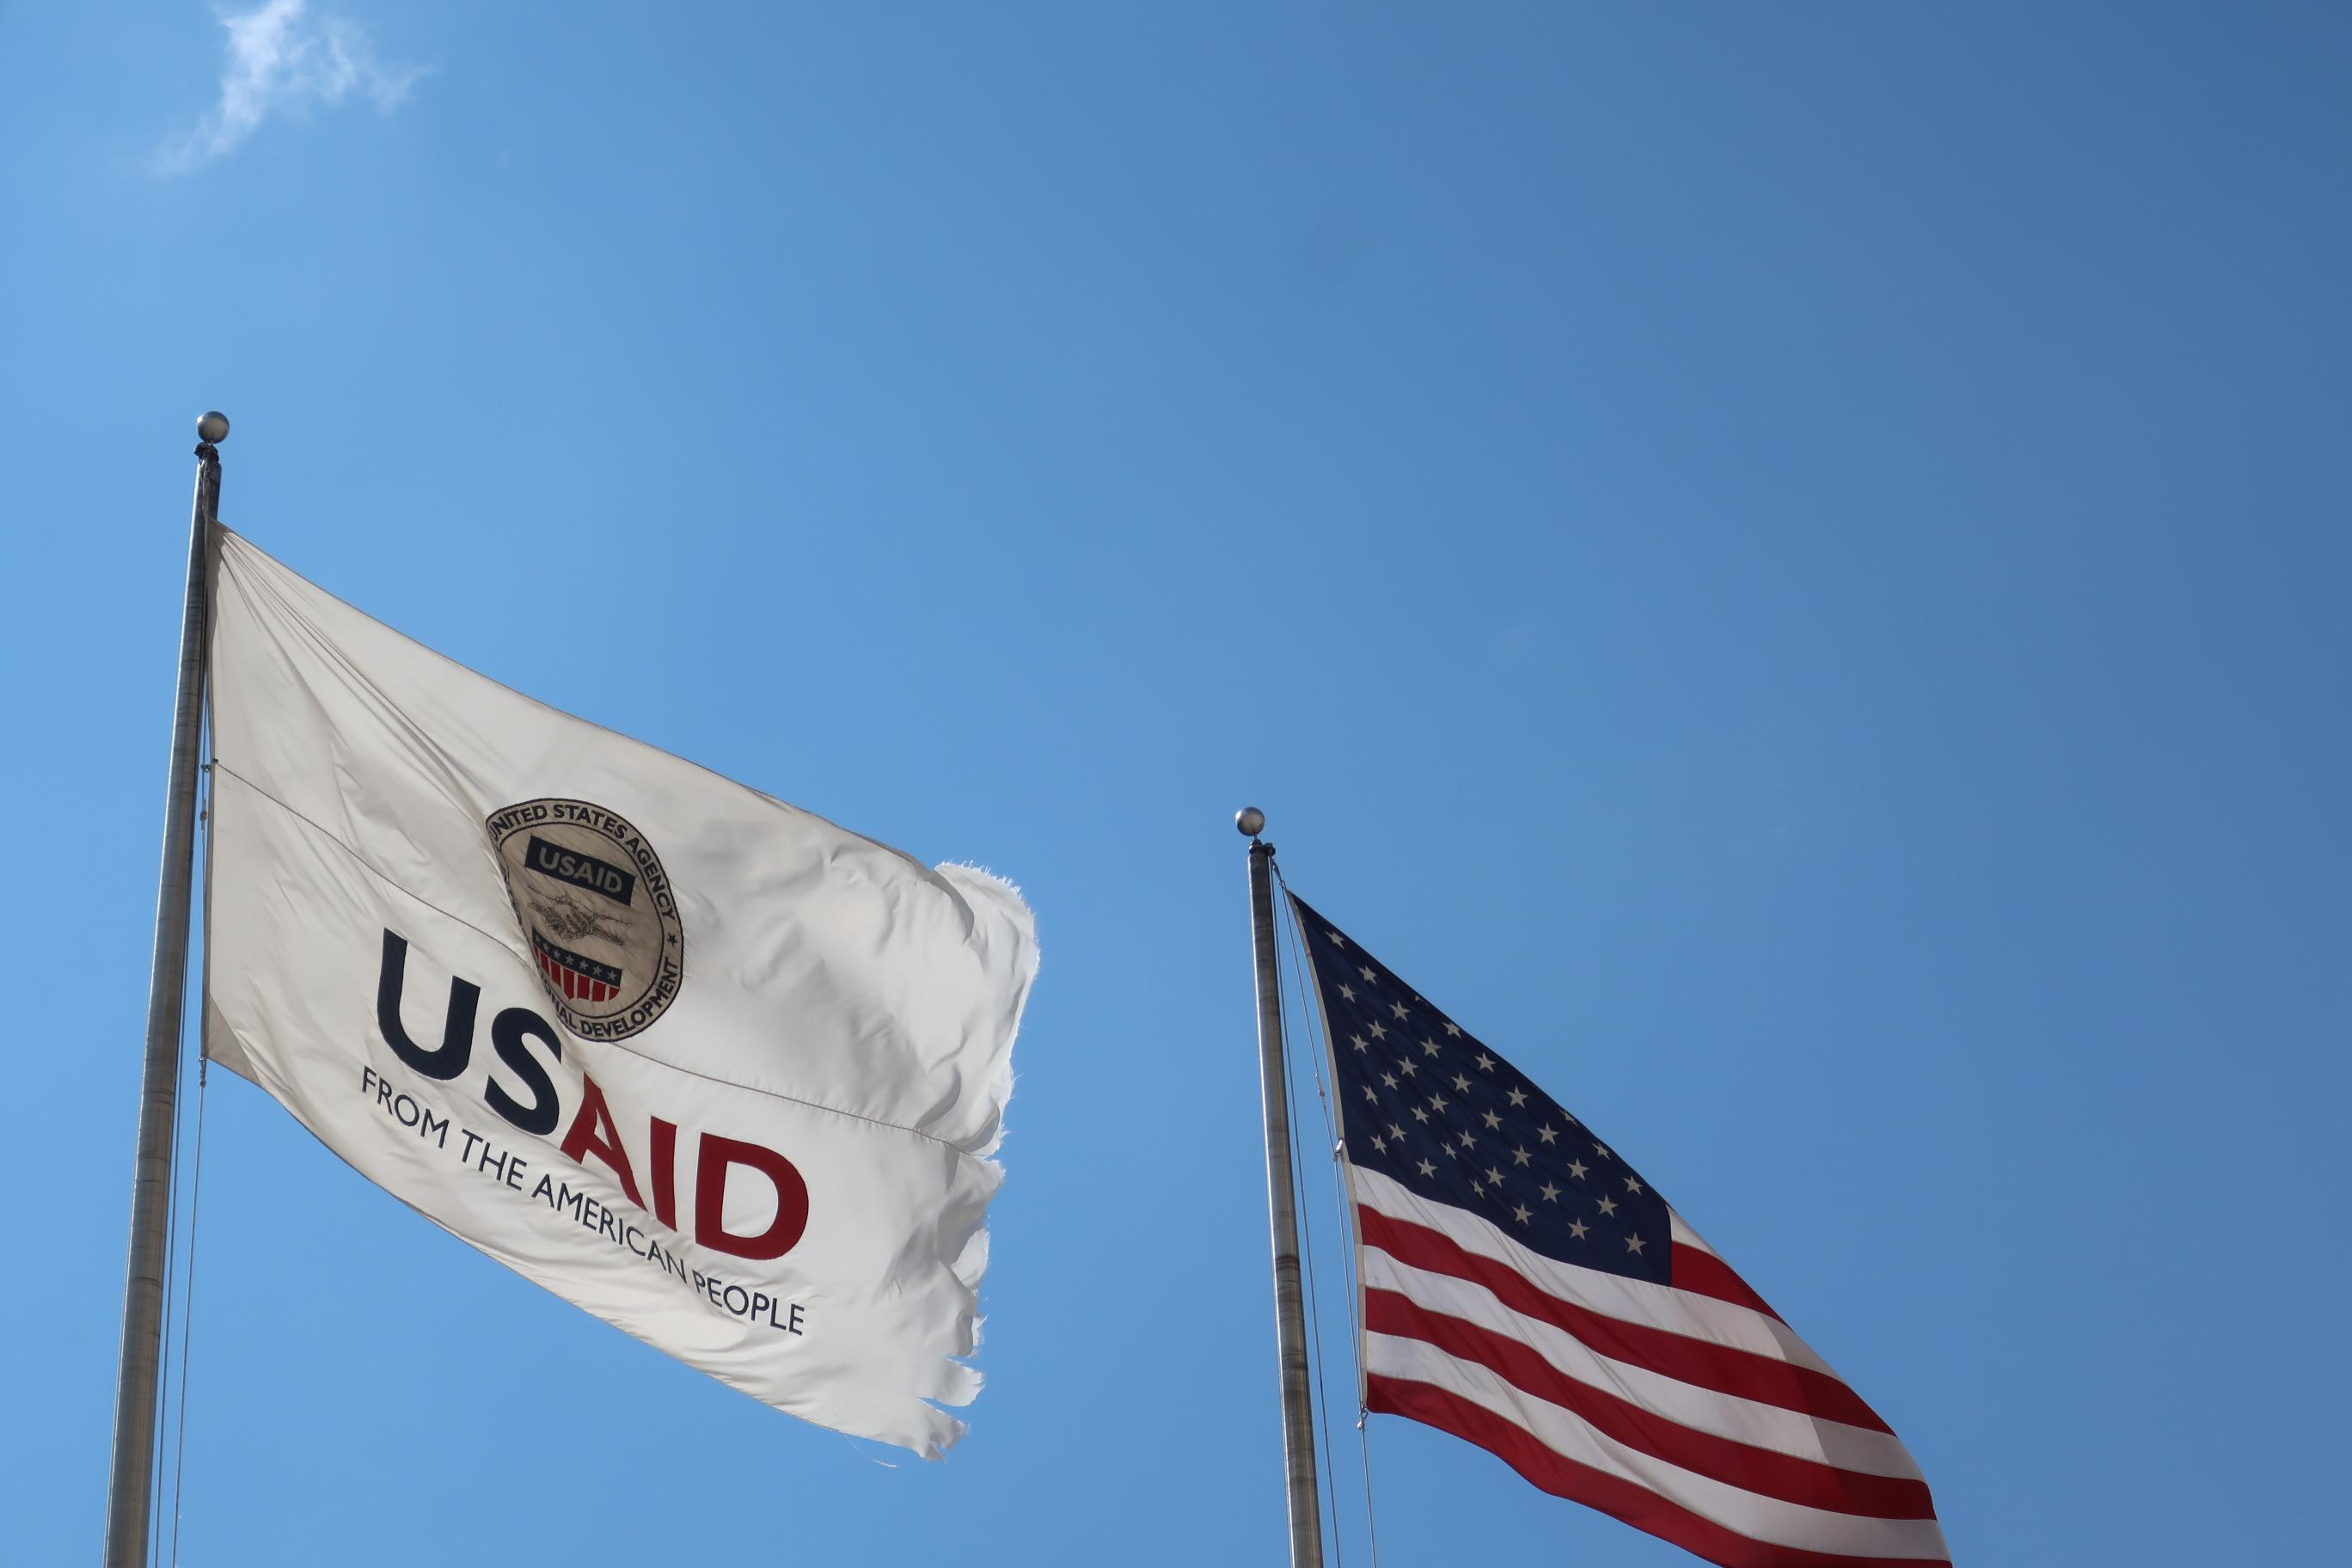 www.brookings.edu: Making USAID a premier development agency